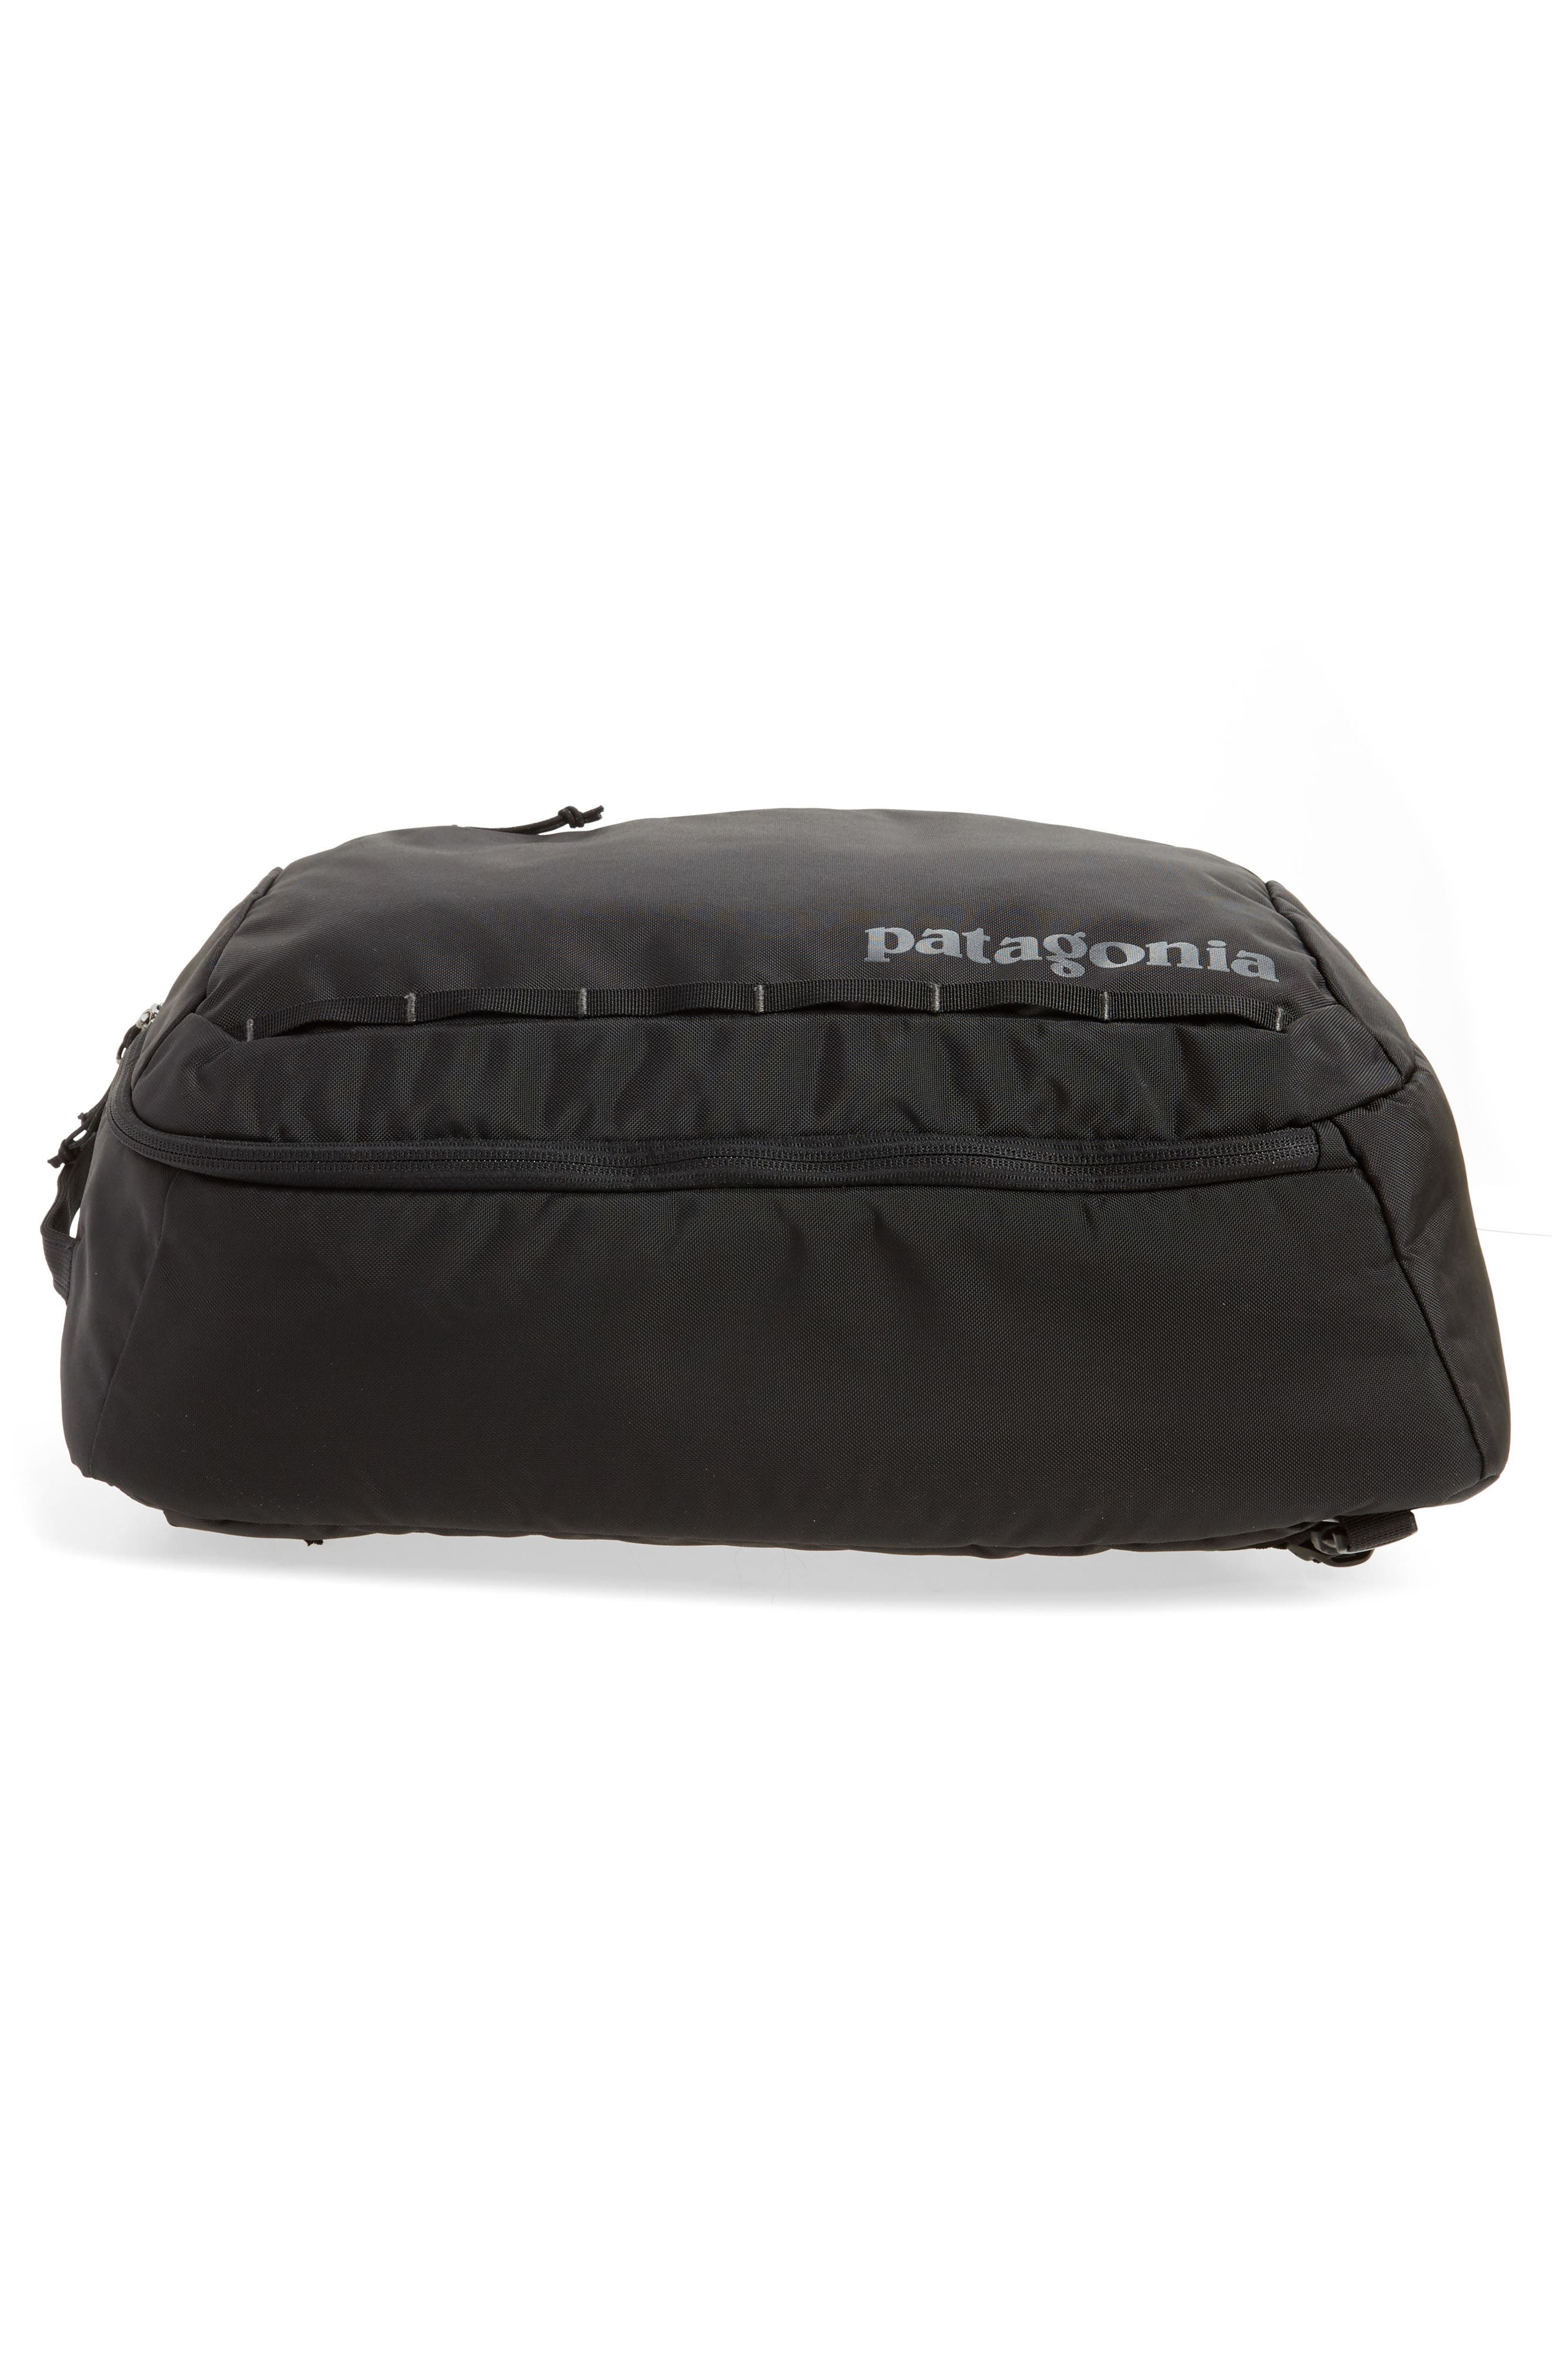 PATAGONIA, Tres 25-Liter Convertible Backpack, Alternate thumbnail 7, color, BLACK